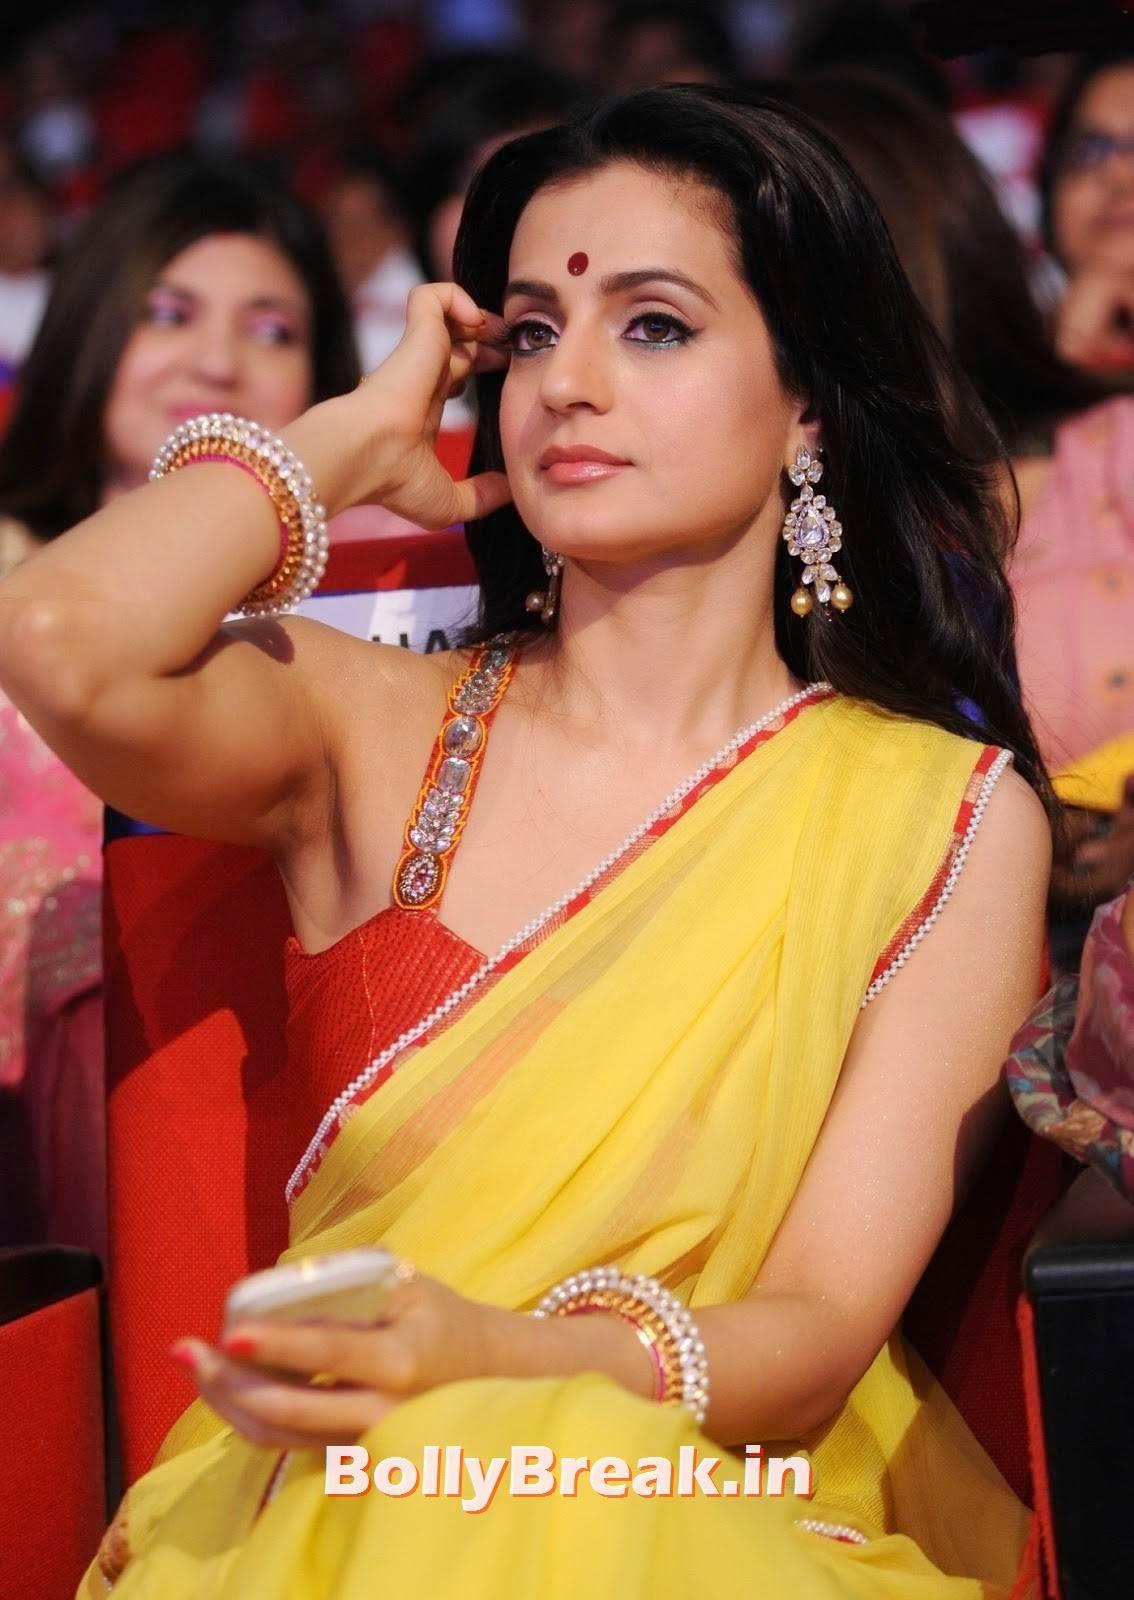 Amisha patel armpit in saree, Amisha Patel Latest hot Photos in Yellow Saree from Event